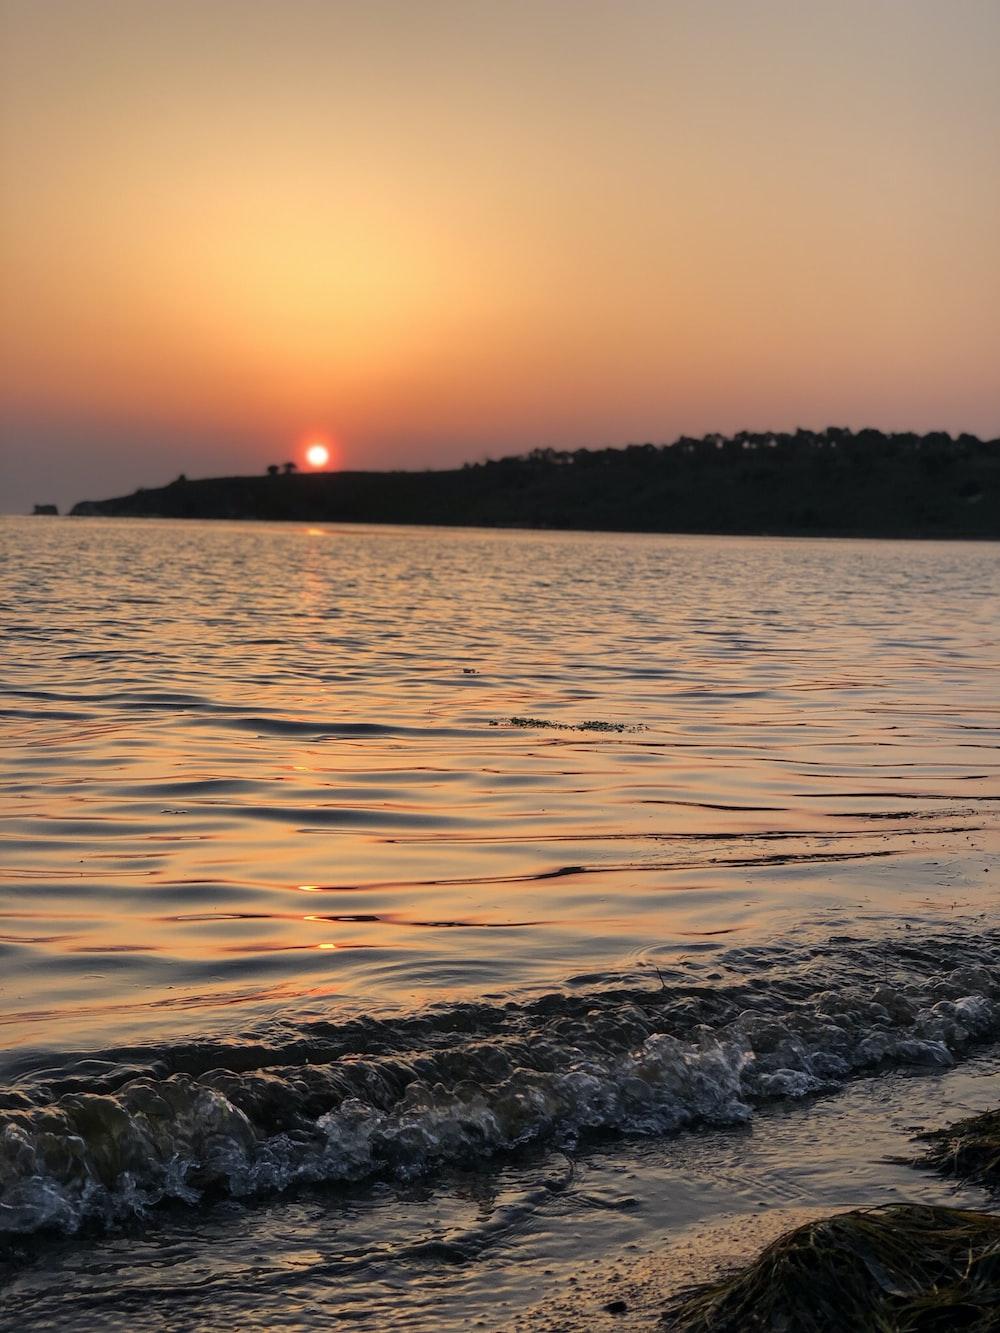 body of water near island at sunset